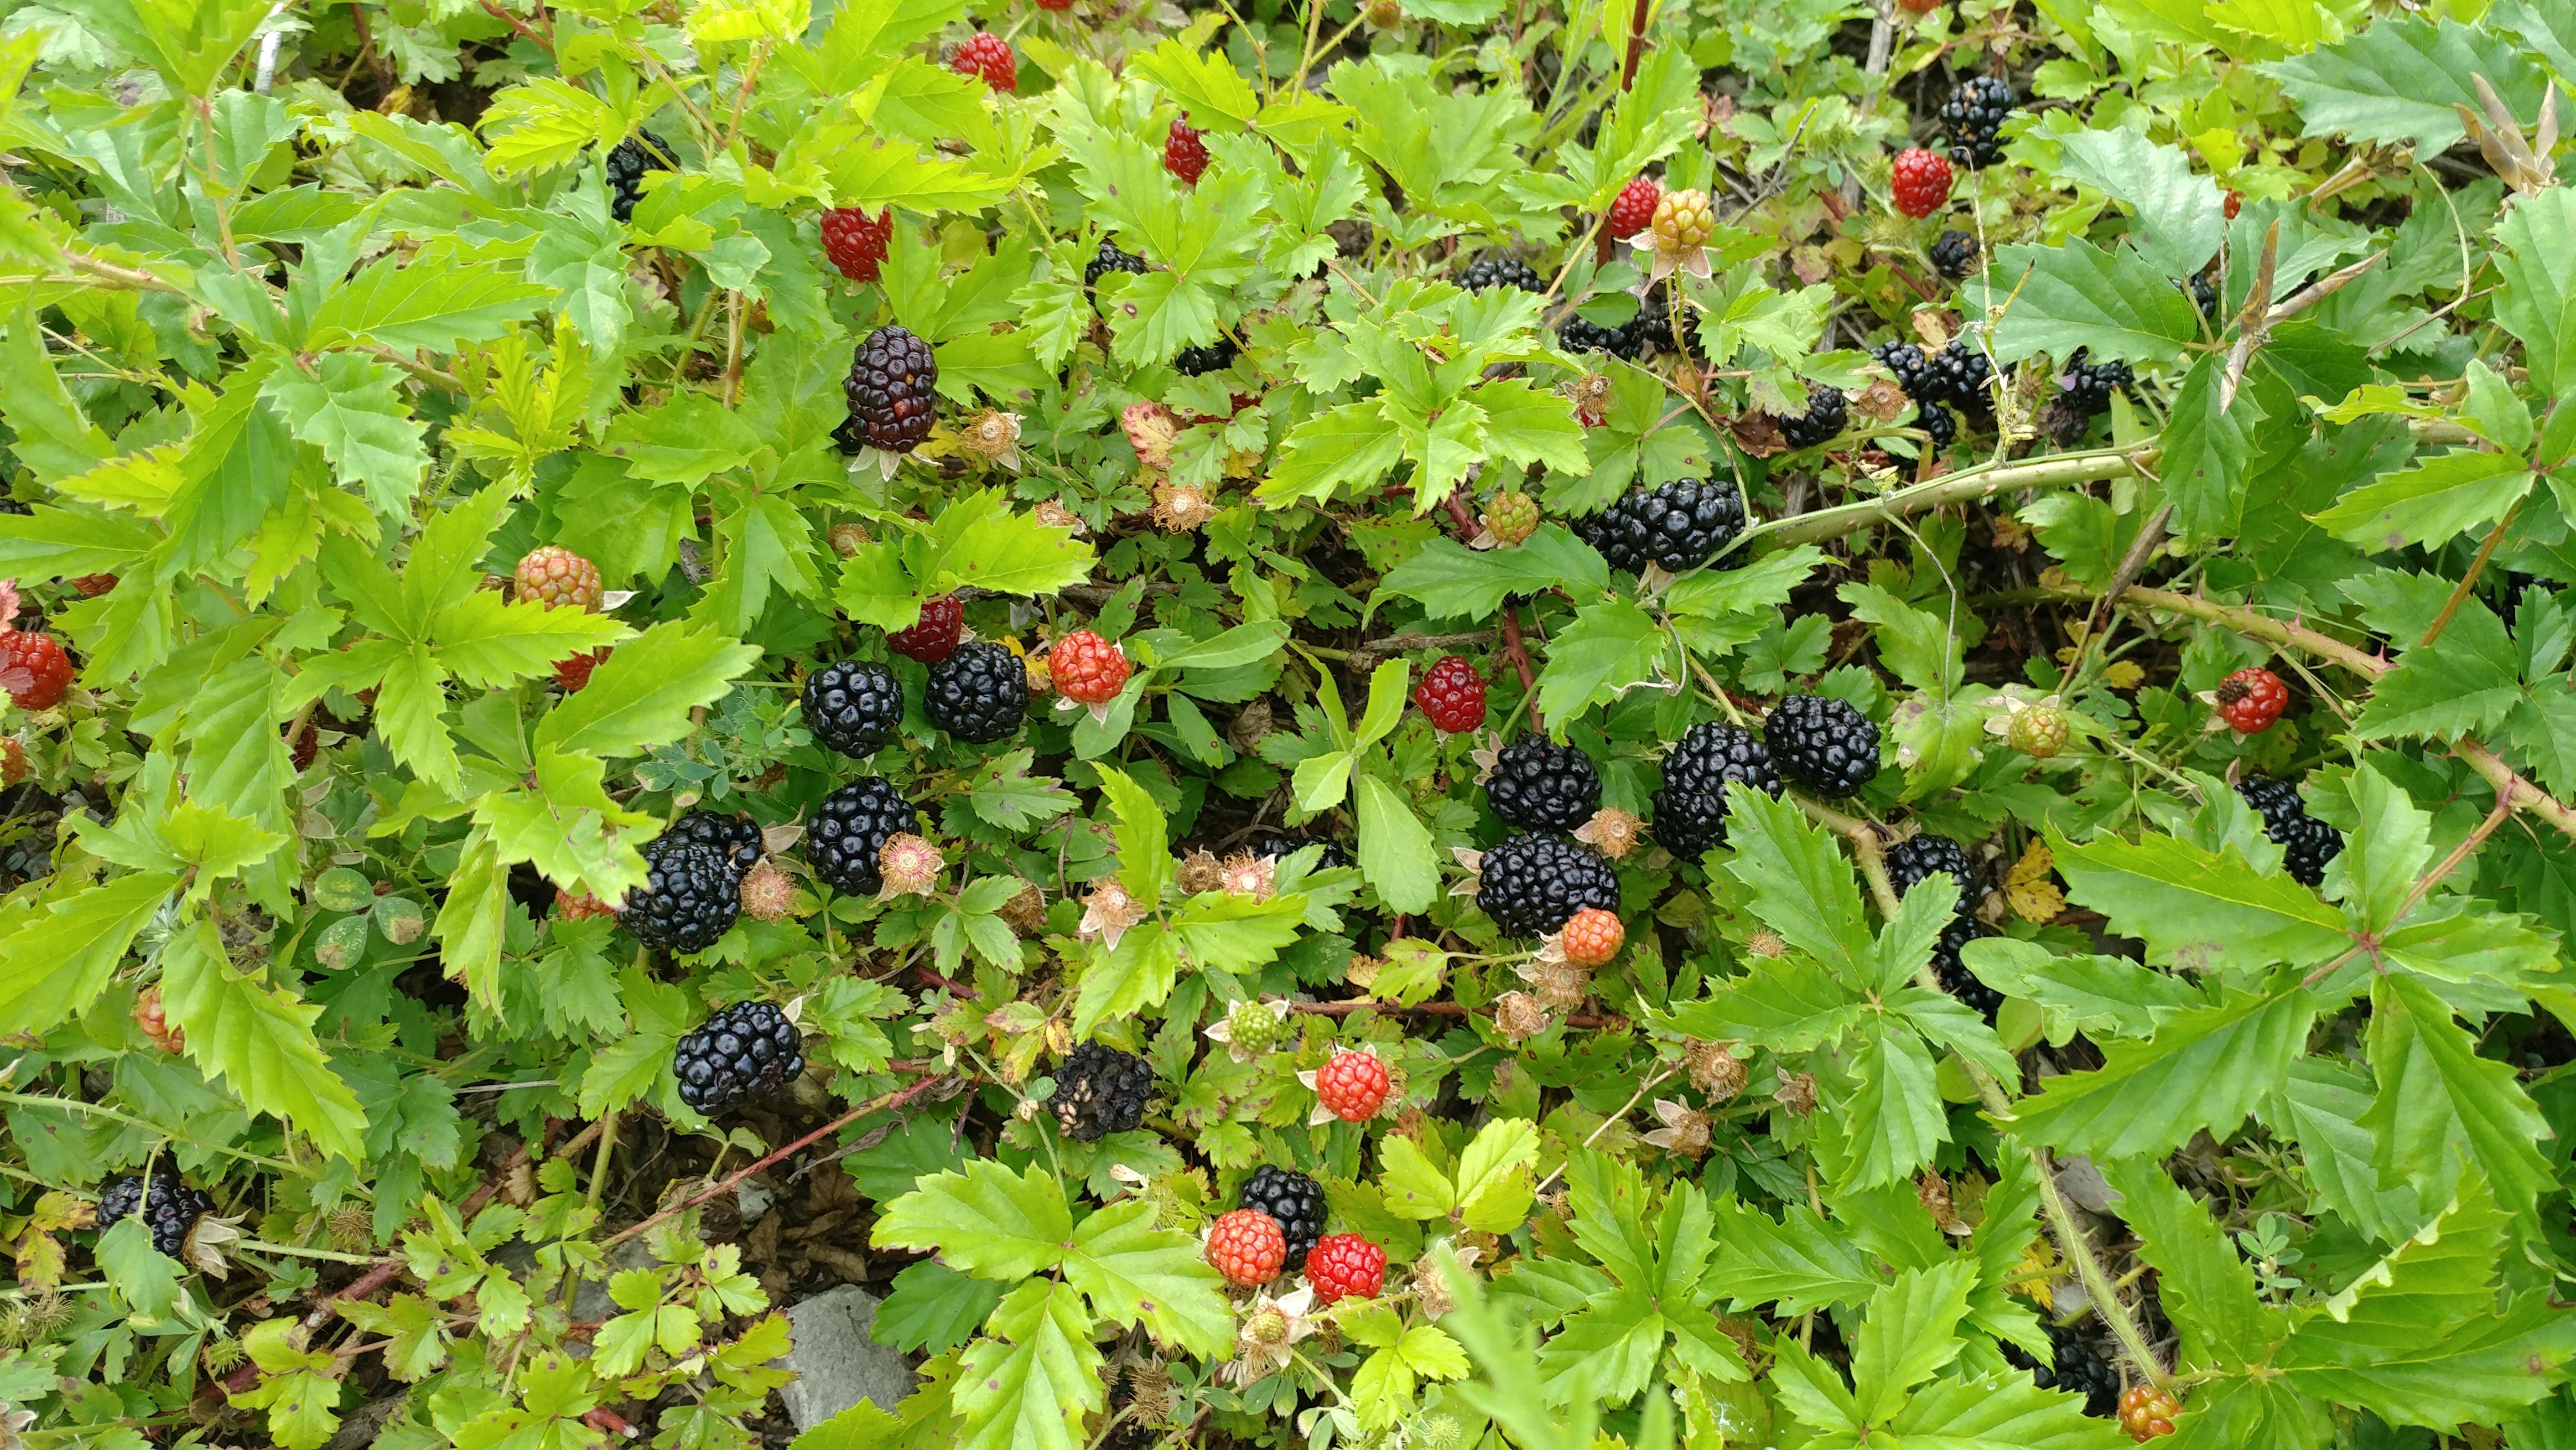 Texas Wild Berries - Album on Imgur